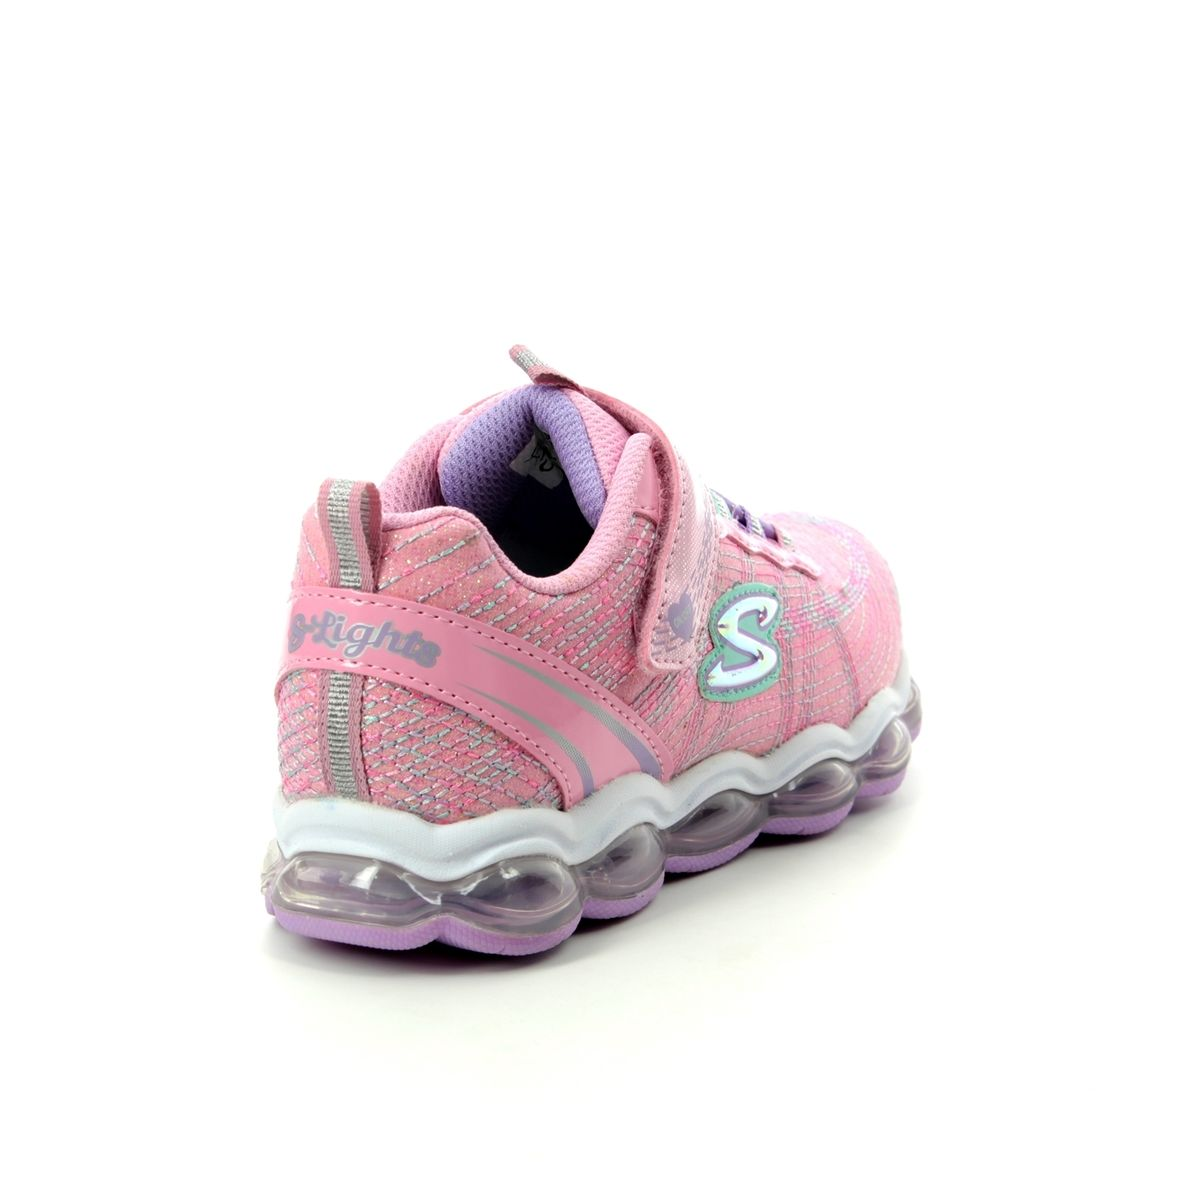 8afcda2951e Skechers Glimmer Lights 10833 LPMT Light pink trainers